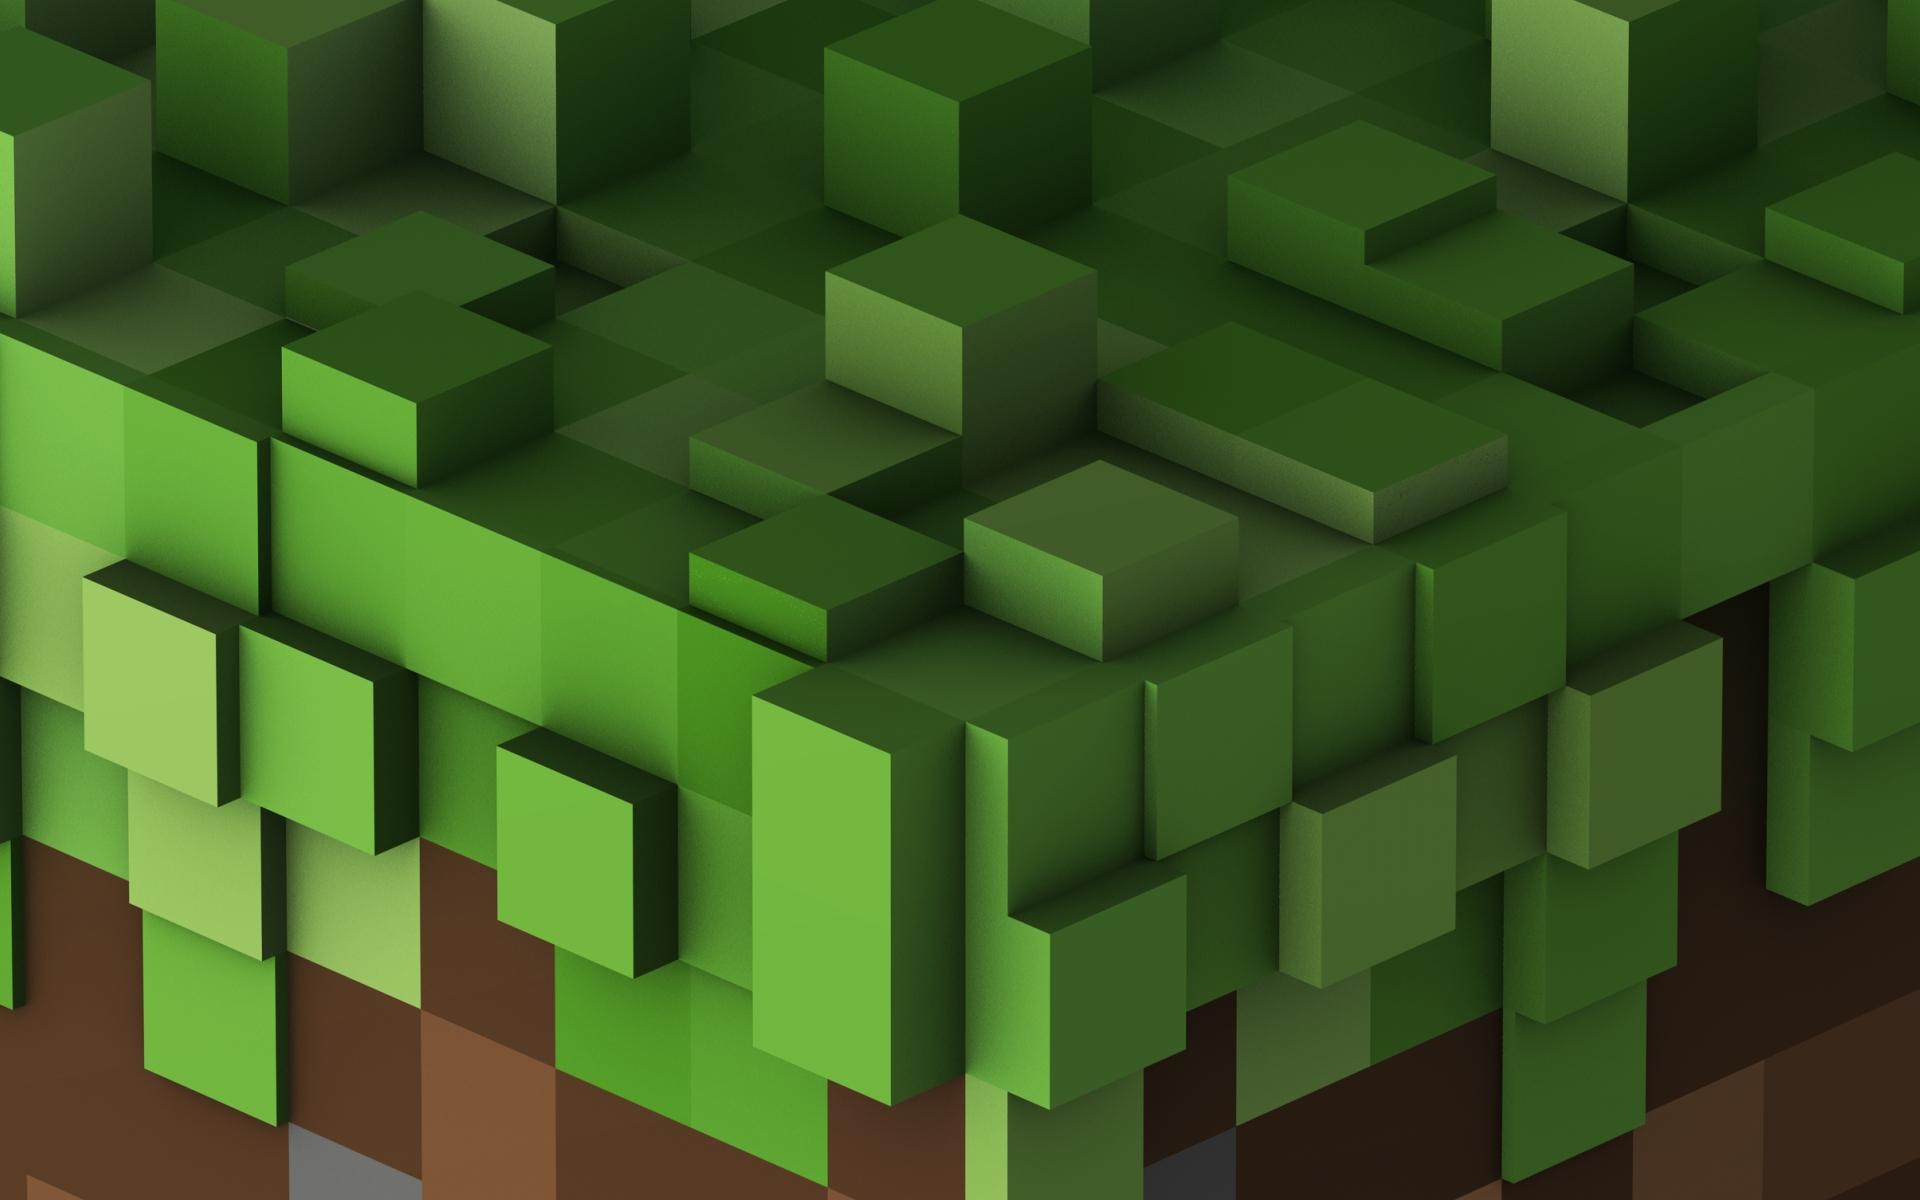 Minecraft Mojang 1920x1200